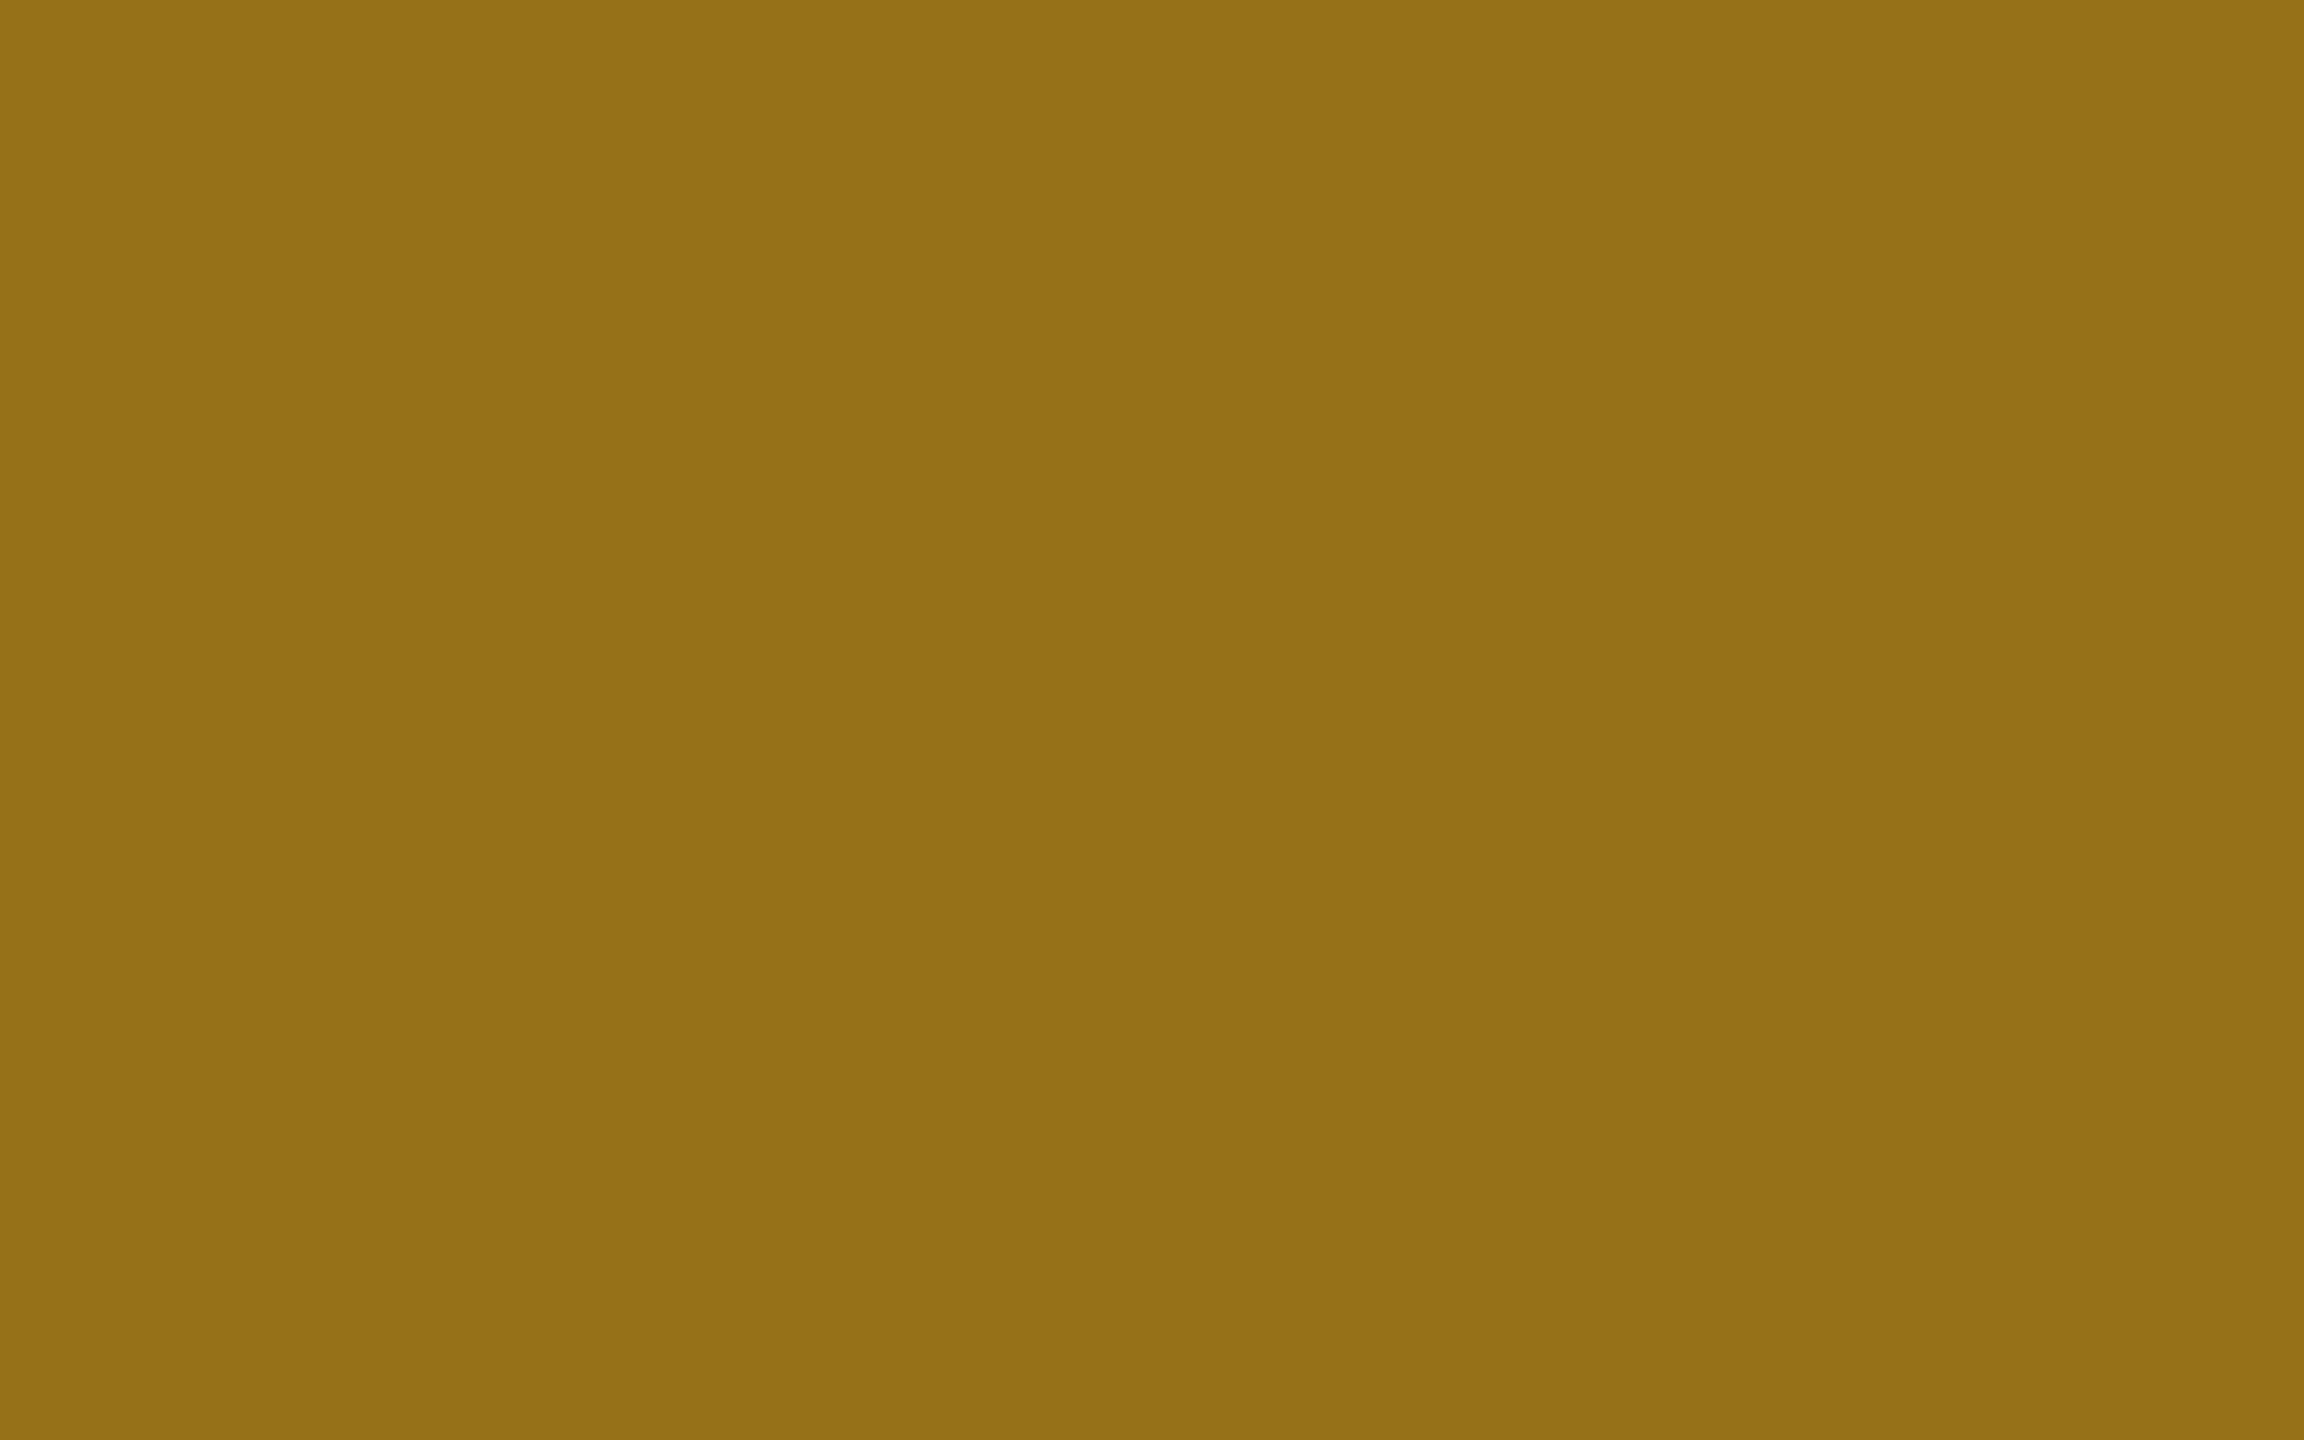 2304x1440 Bistre Brown Solid Color Background